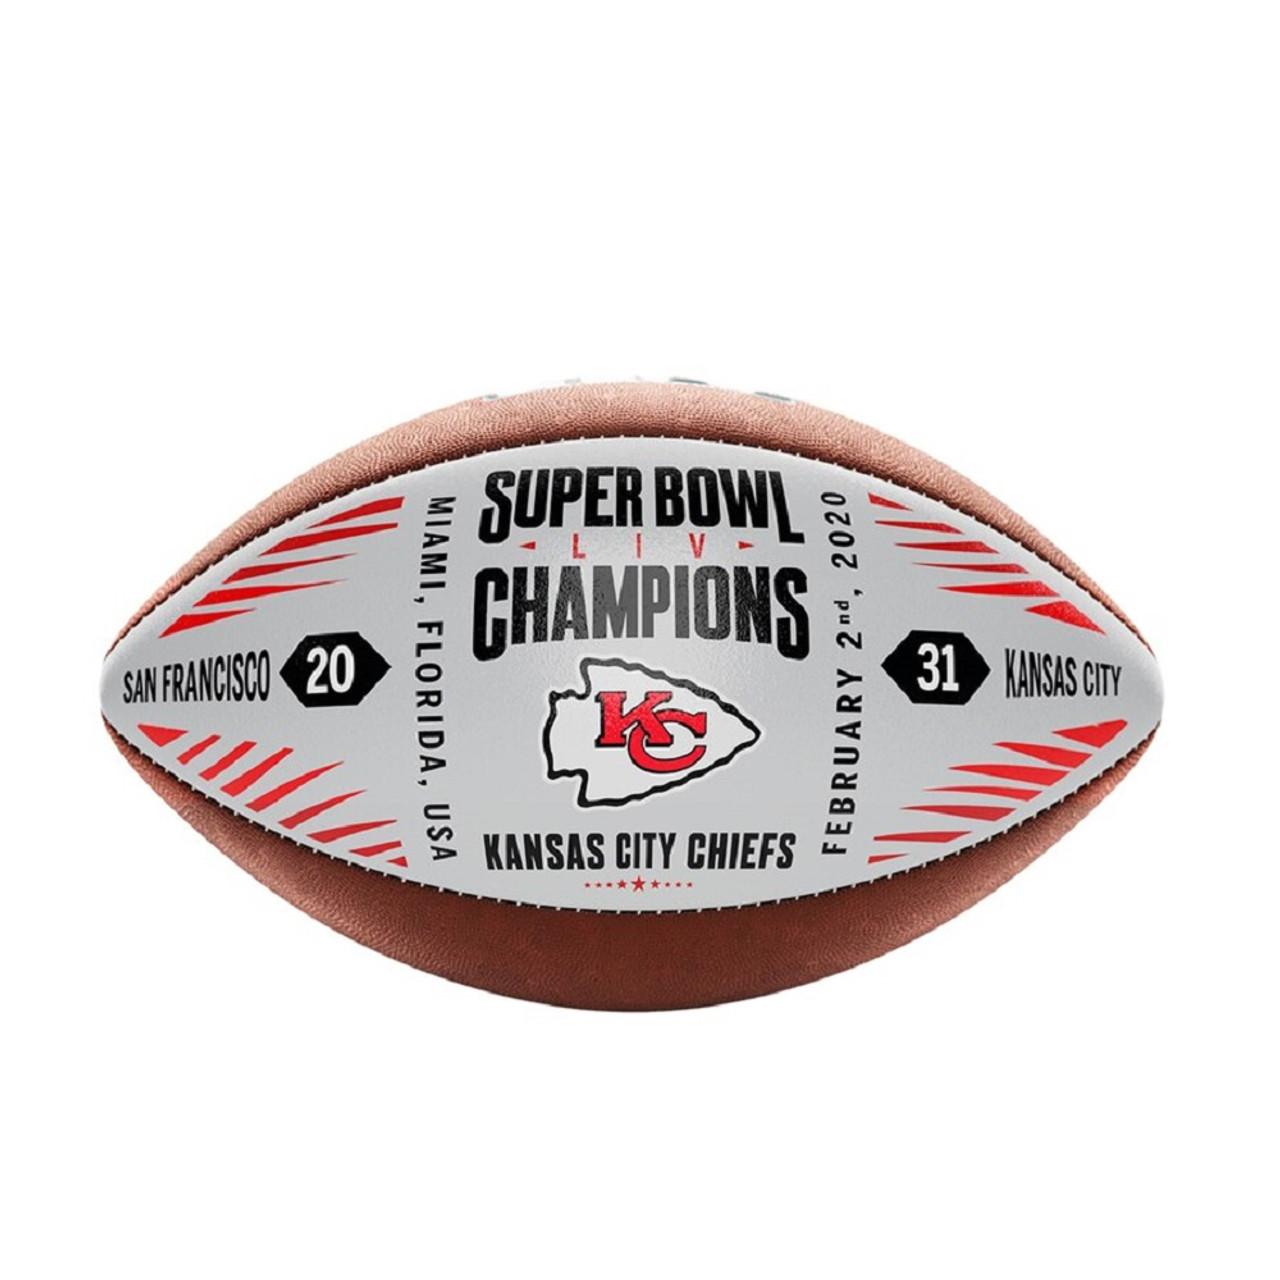 Kansas City Chiefs Football Metallic Leather Super Bowl 54 Champs